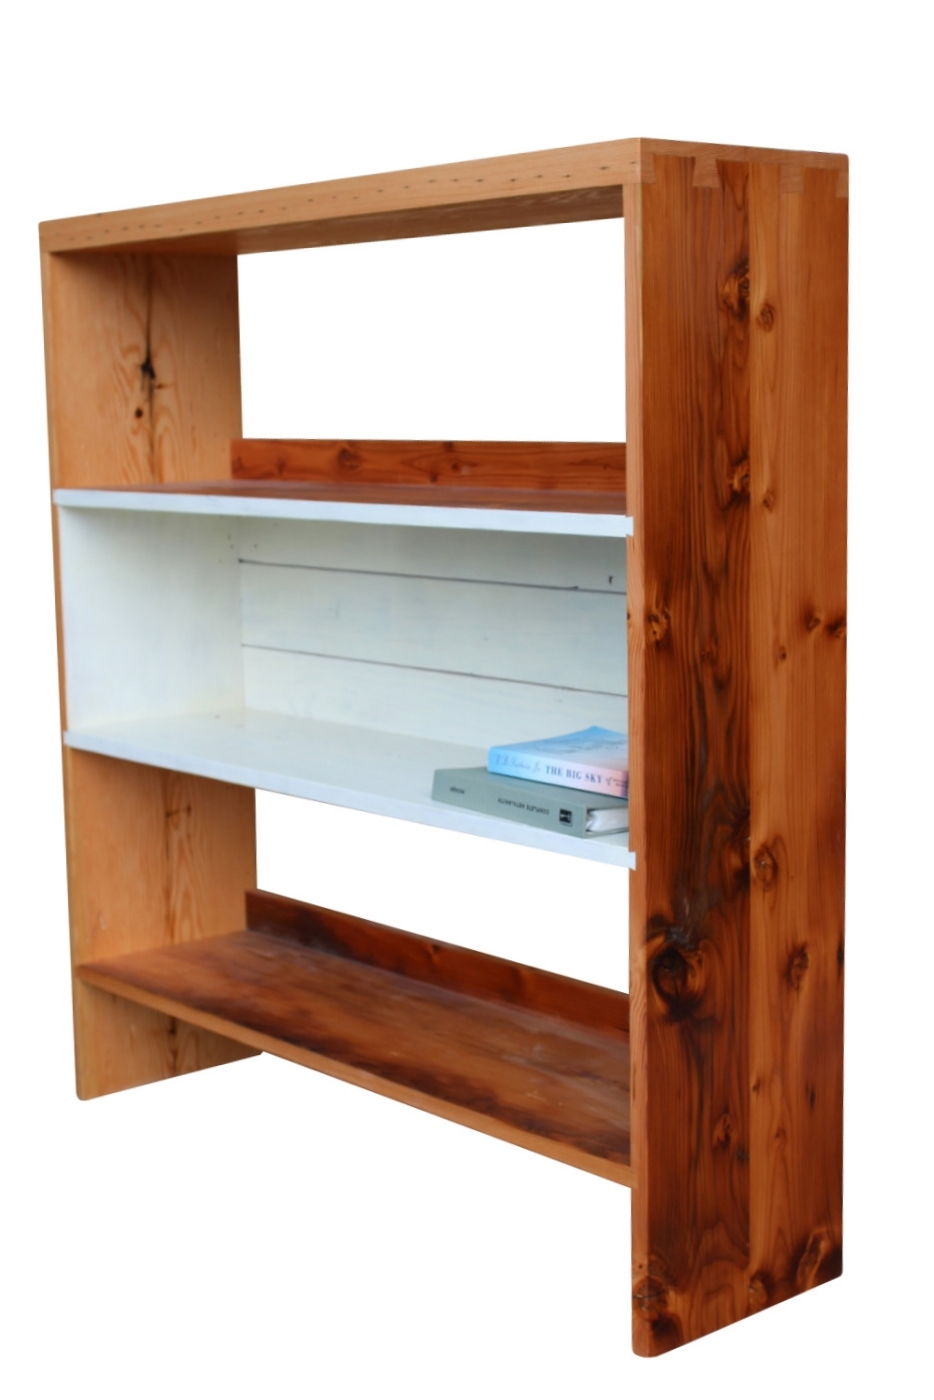 bookcases 4-4-14 308.JPG